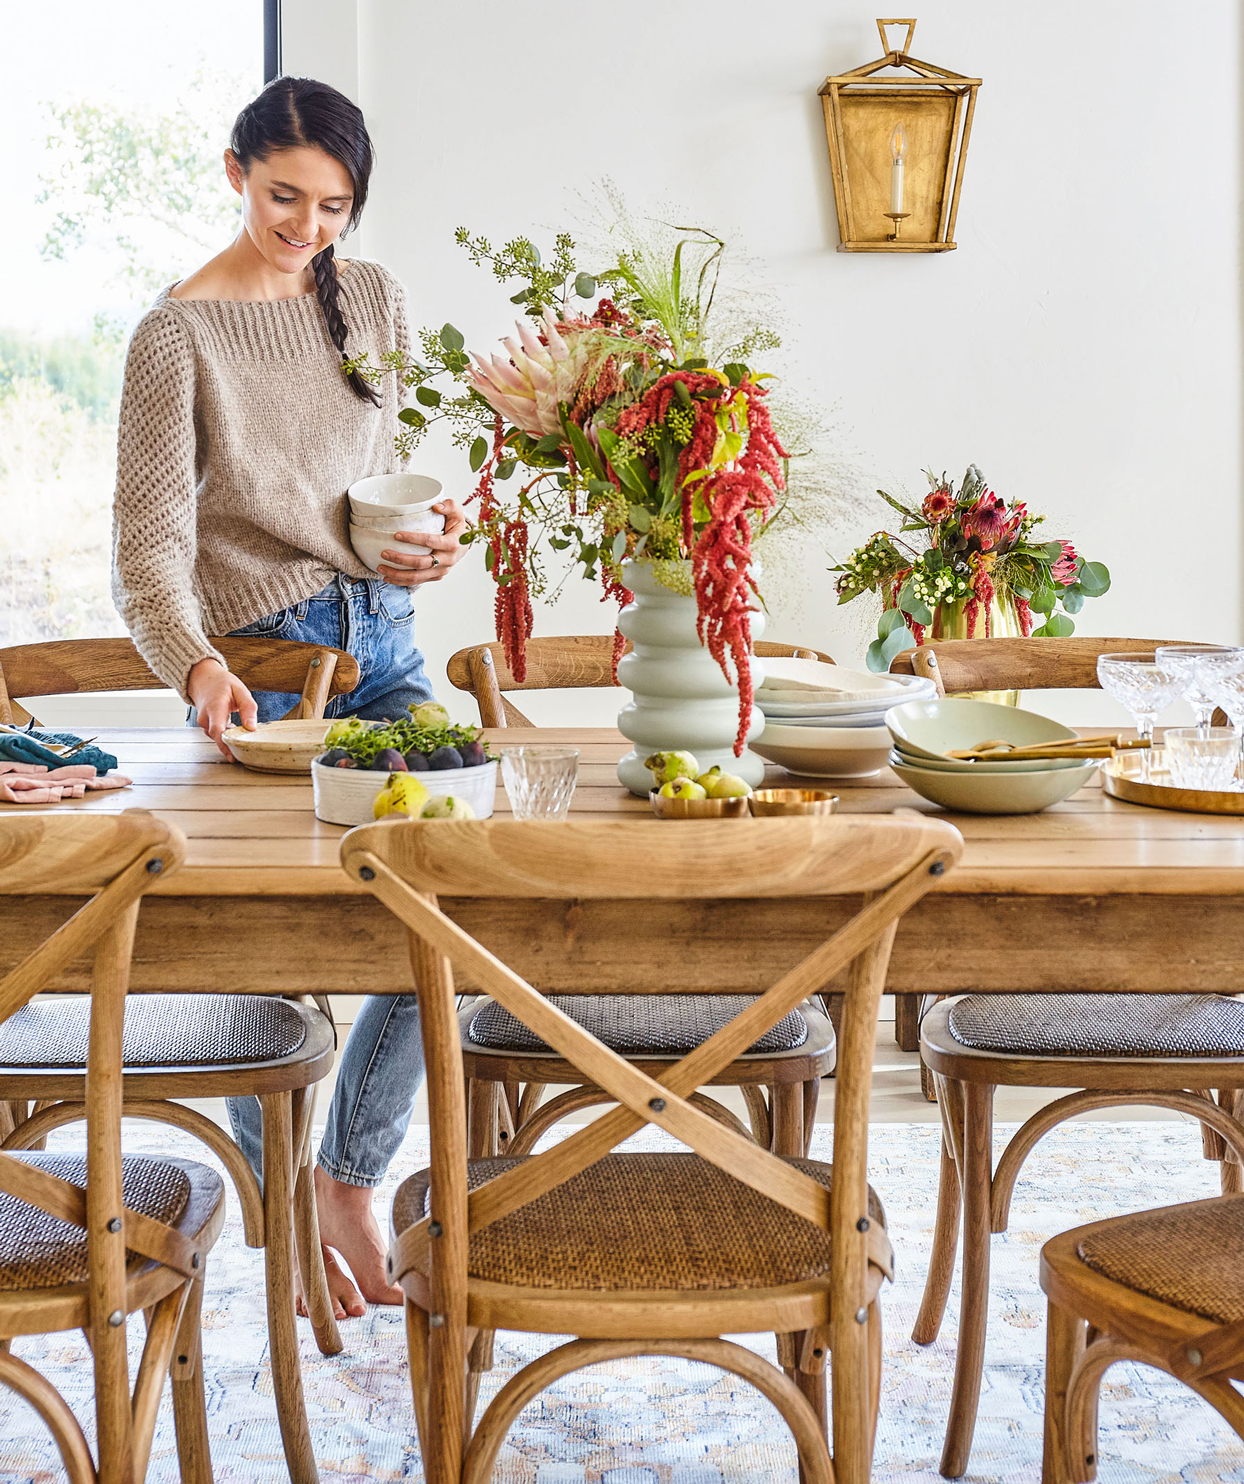 tieghan gerard setting table